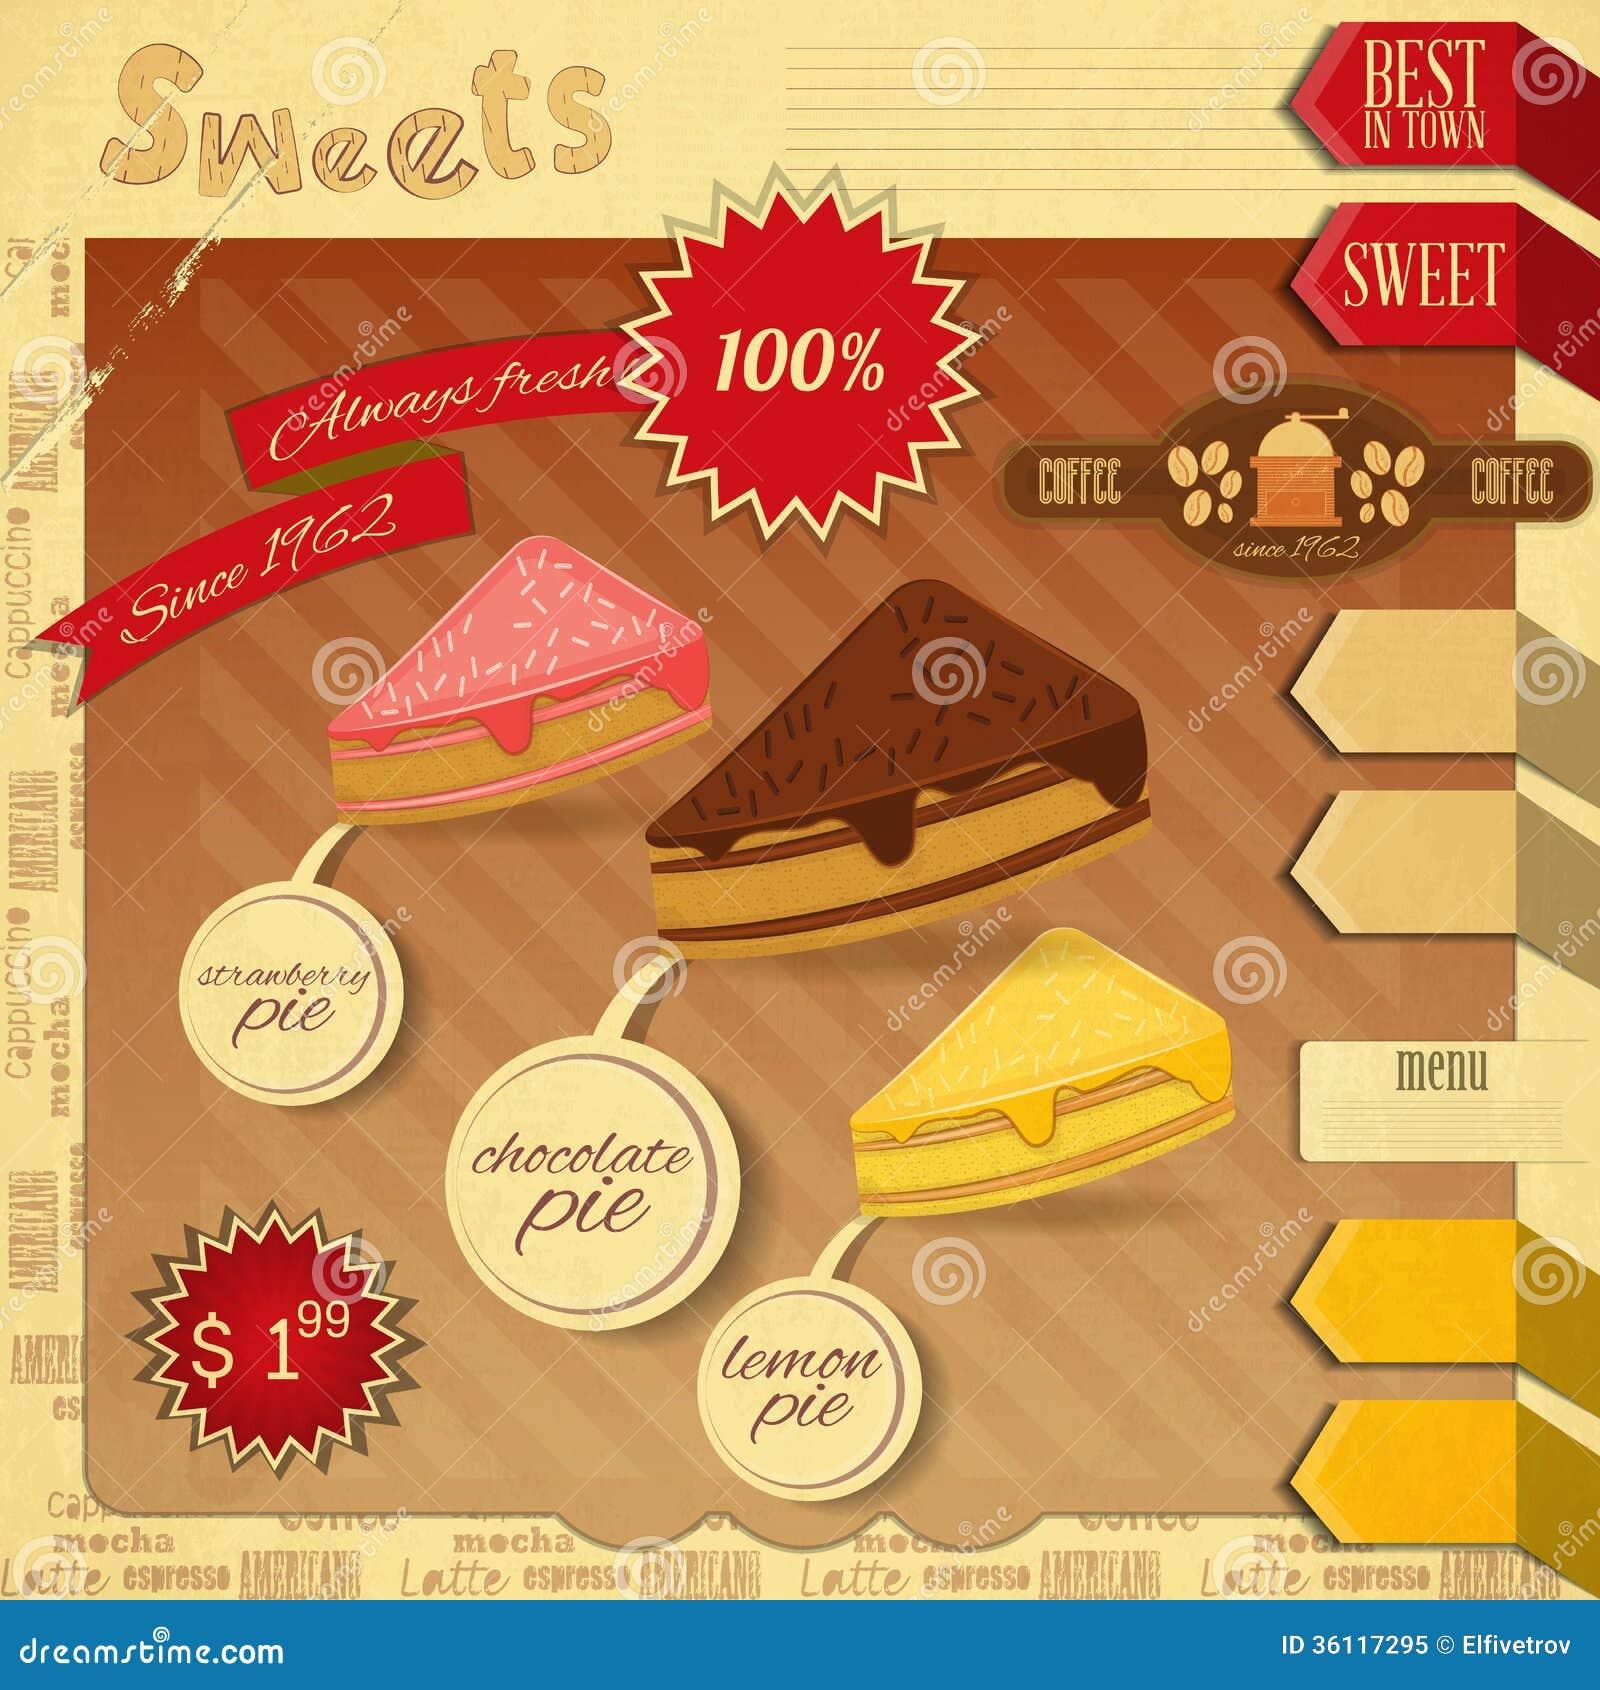 Sweet Cakes Cafe Menu